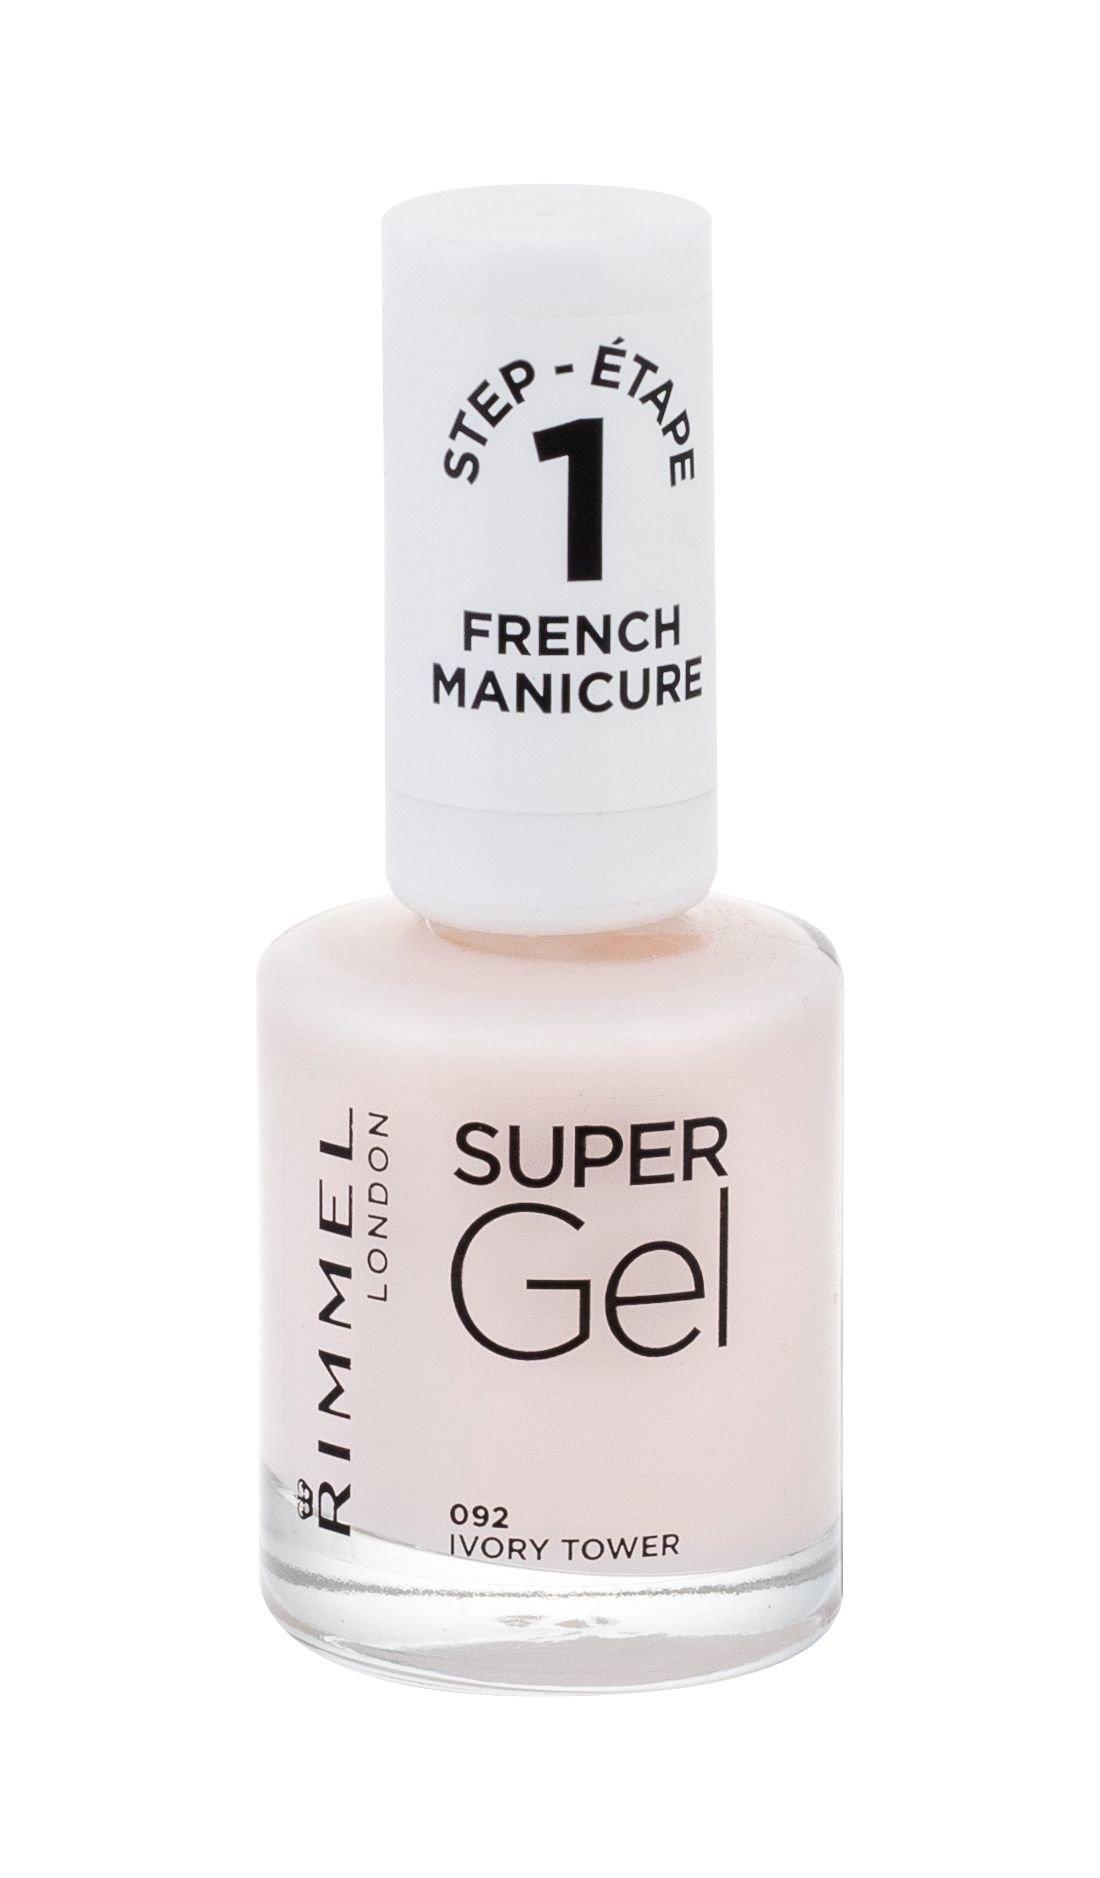 Rimmel London Super Gel French Manicure Nail Polish 12ml 092 Ivory Tower